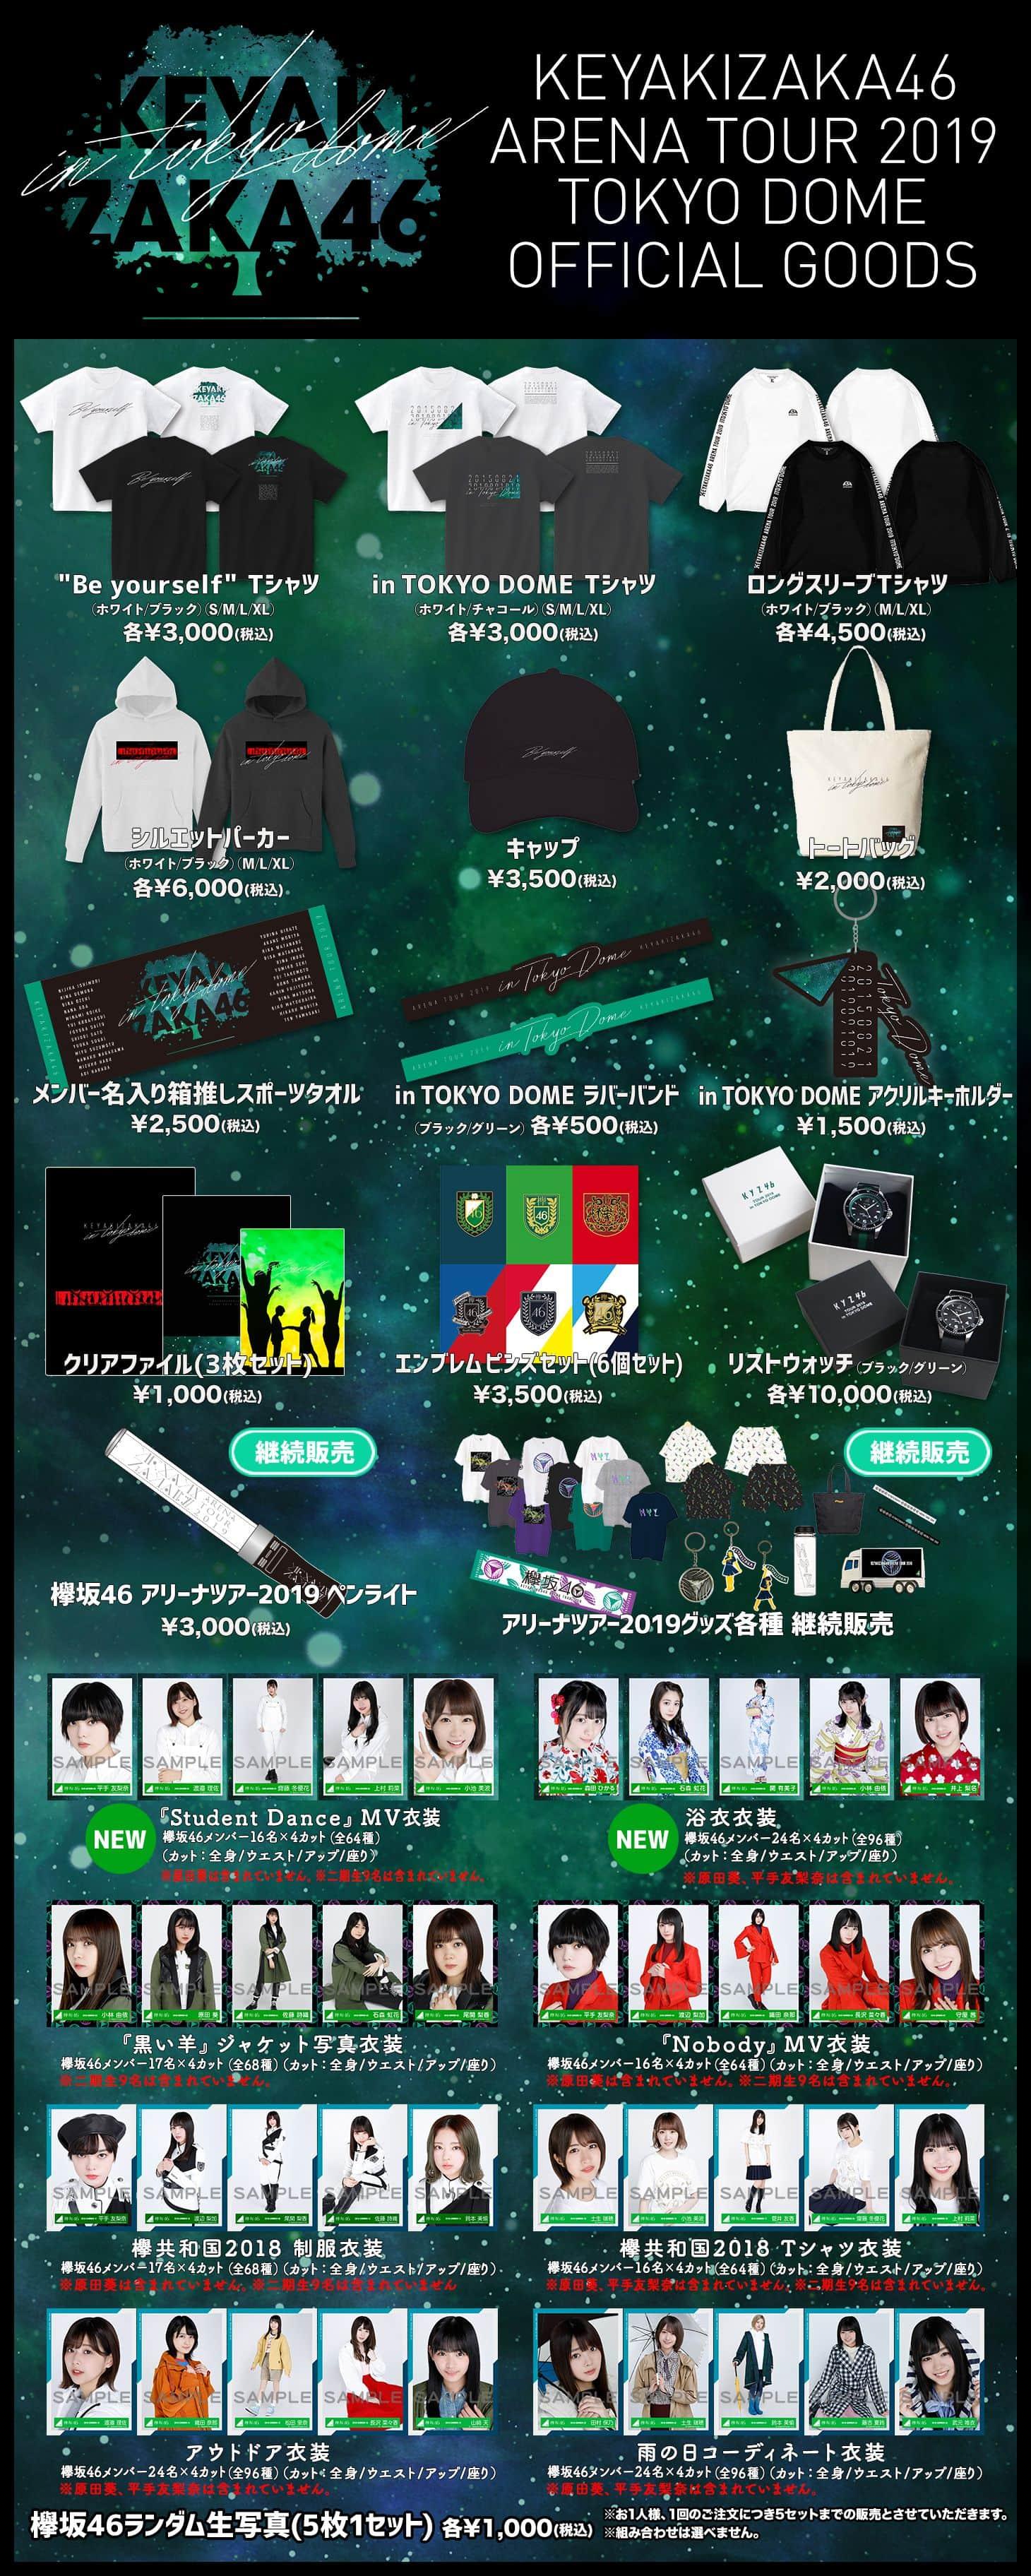 kyk46_arenatour2019-tokyo-dome_goods_all-11-MAX